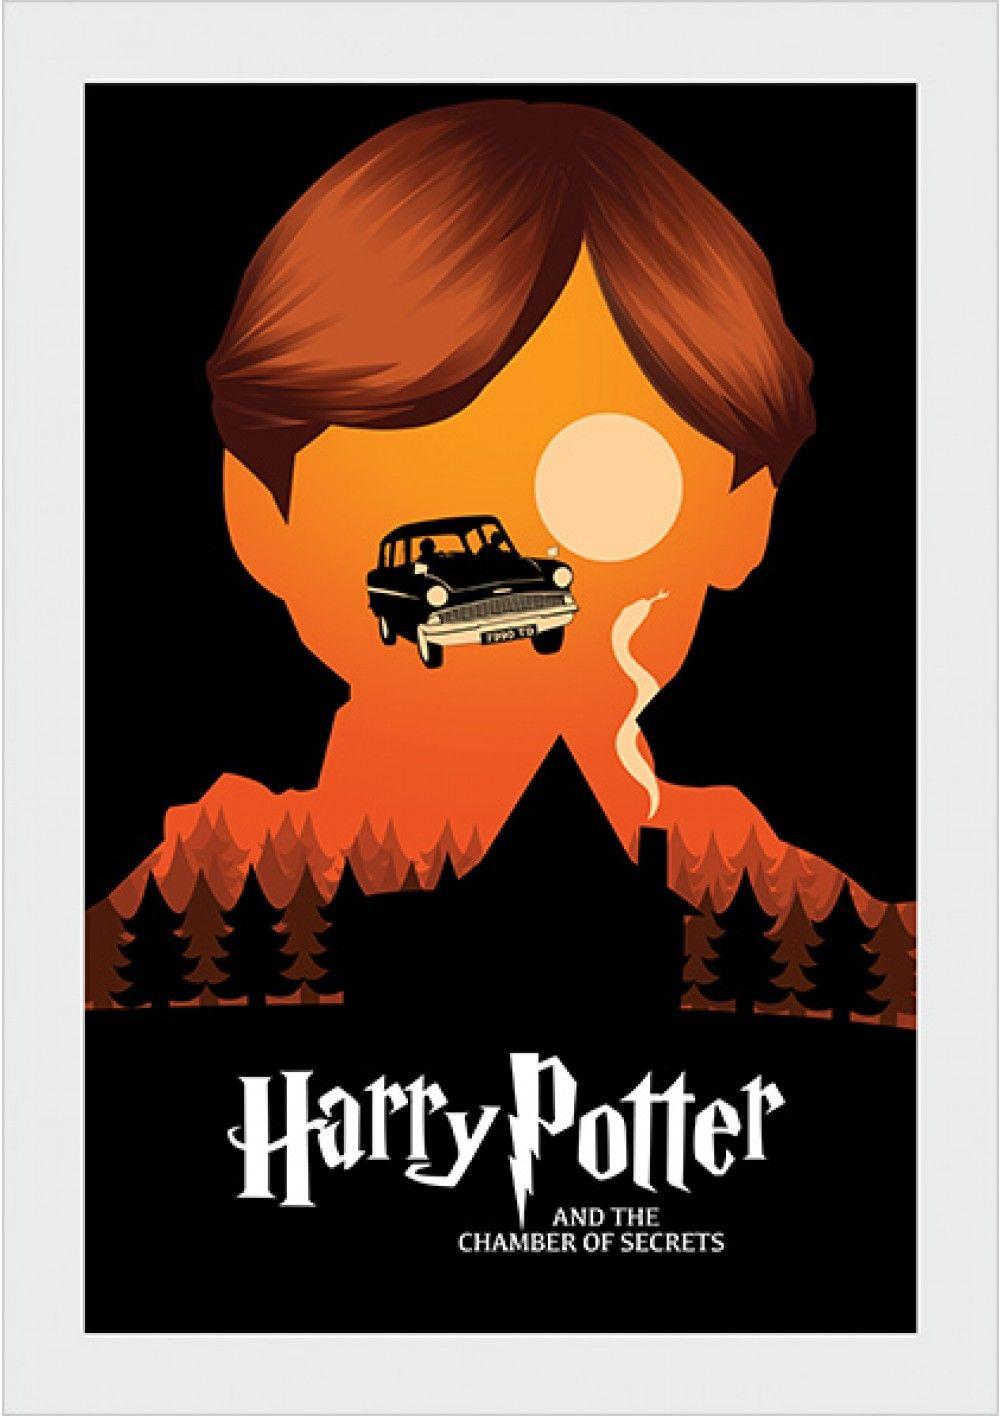 Populares Câmara Secreta - Harry Potter - Livros | Posters Minimalistas  PF08